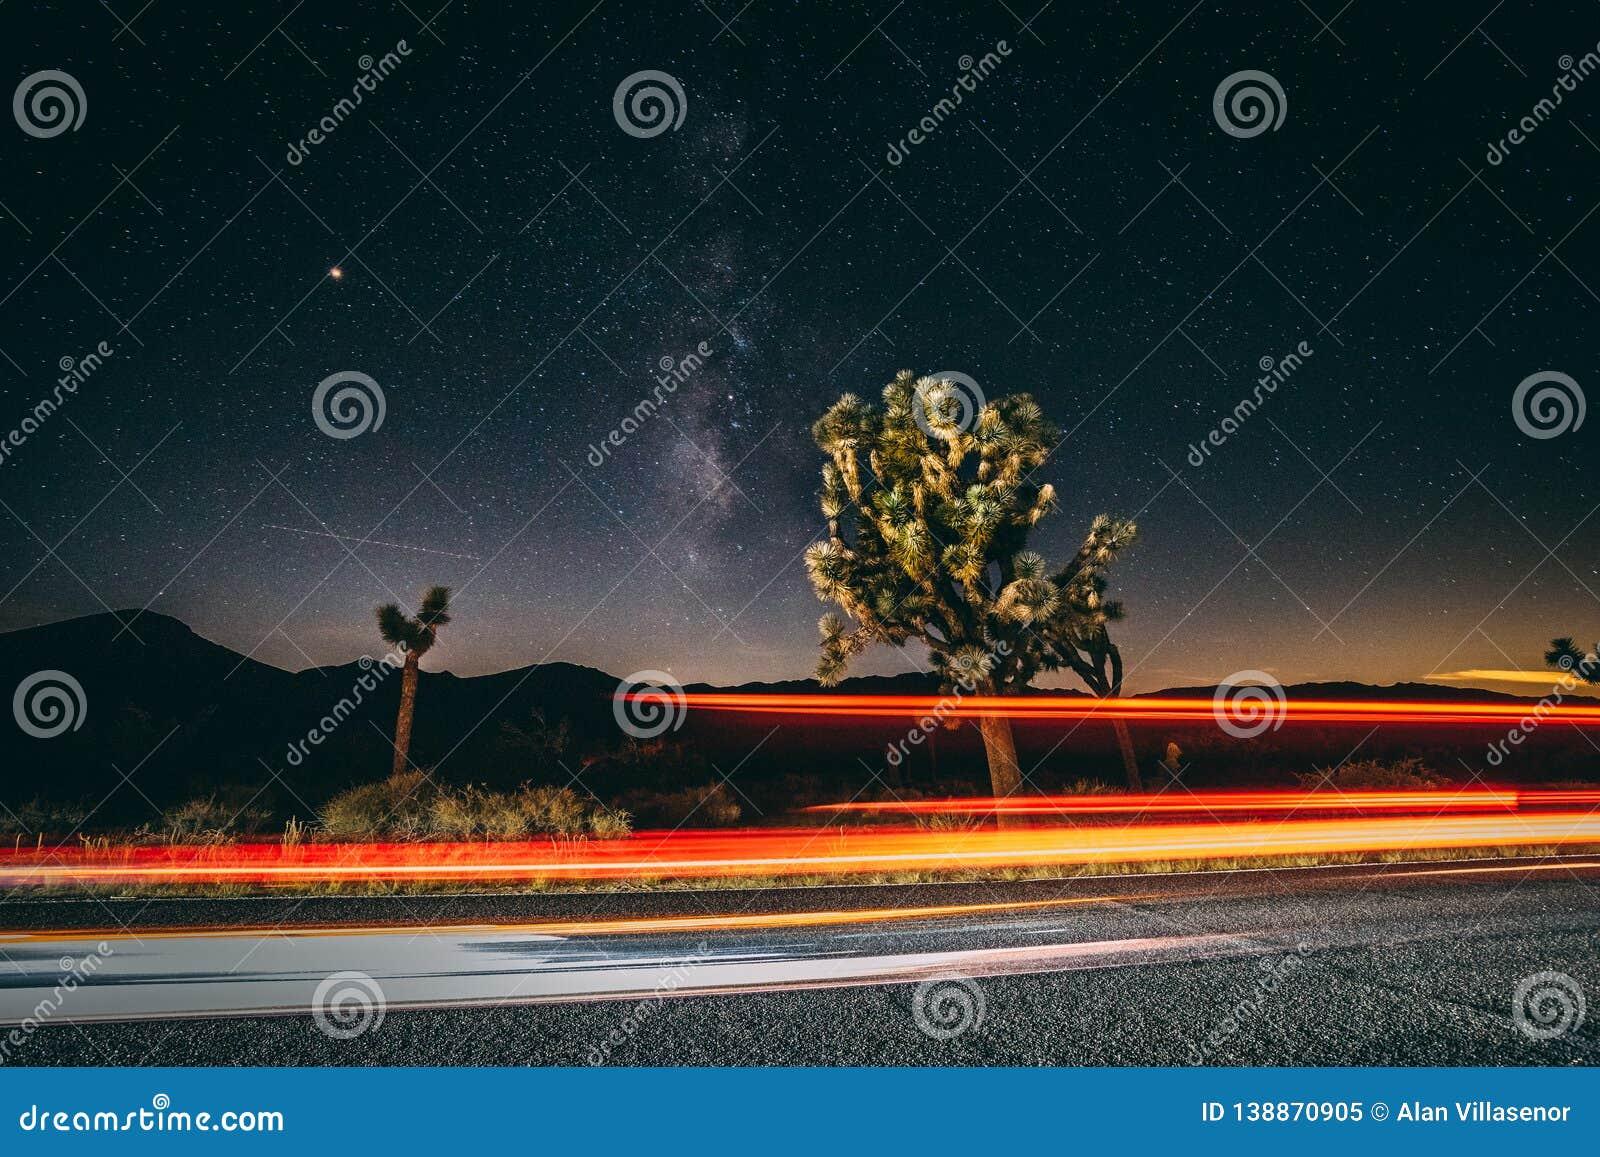 Light Rays and Milky Ways take over Joshua Tree